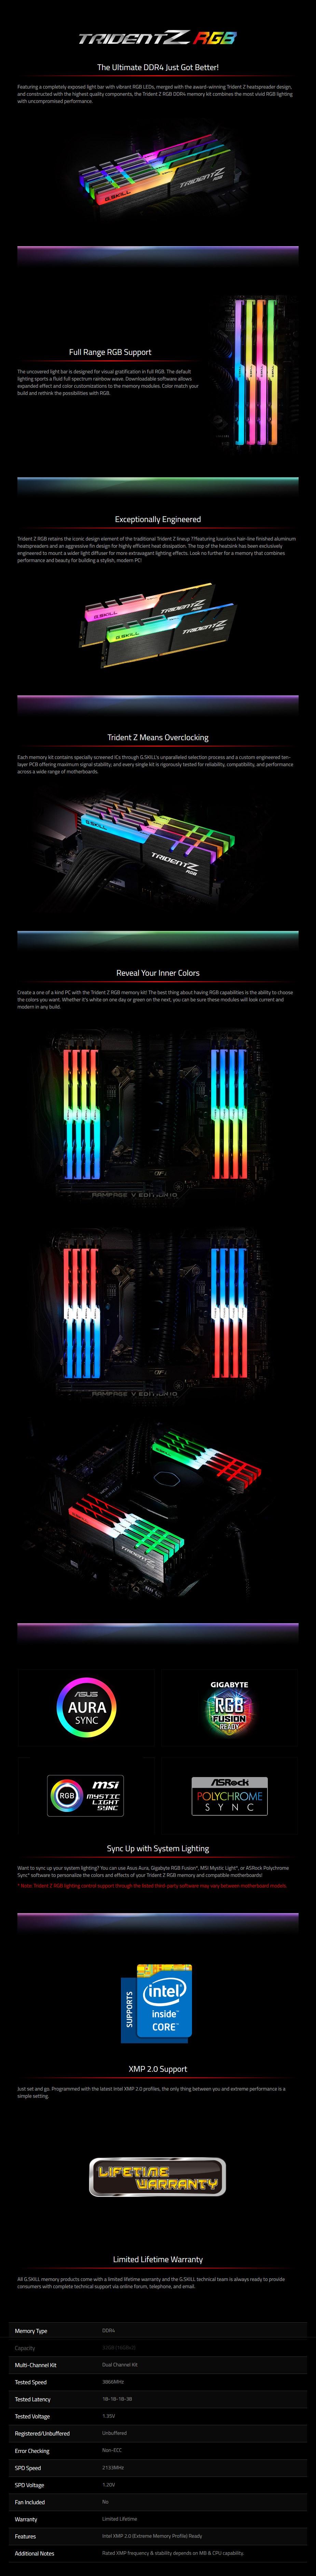 G.Skill Trident Z RGB 32GB (2x 16GB) DDR4 3866MHz Memory - Overview 1